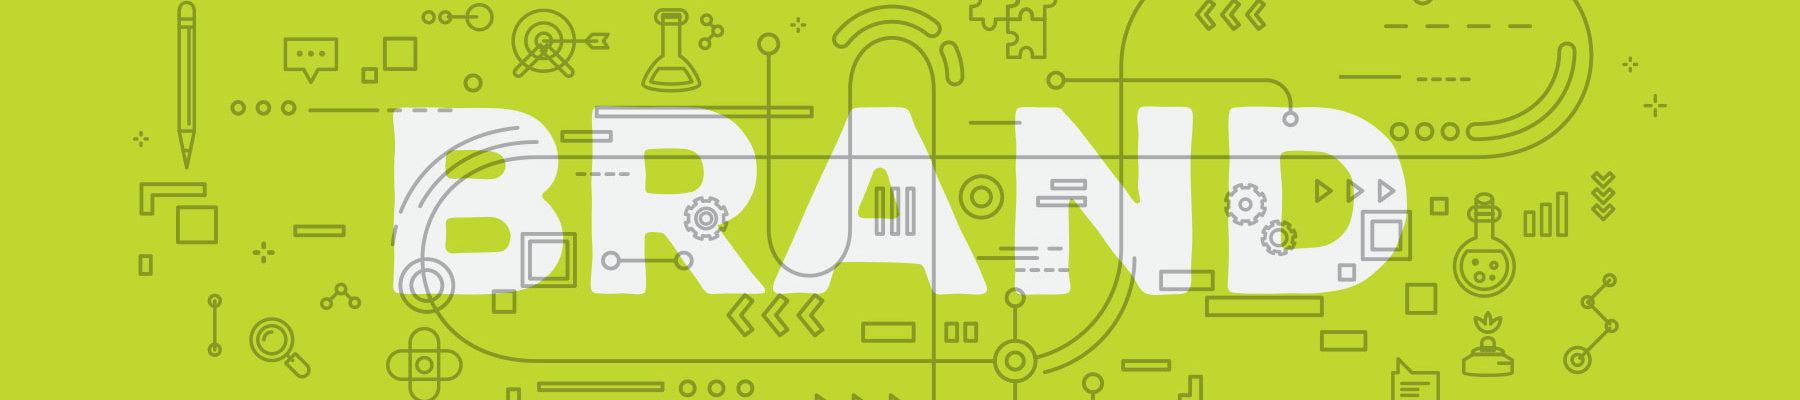 Small Business Logo Design Process And Logo Design & Brand Identity